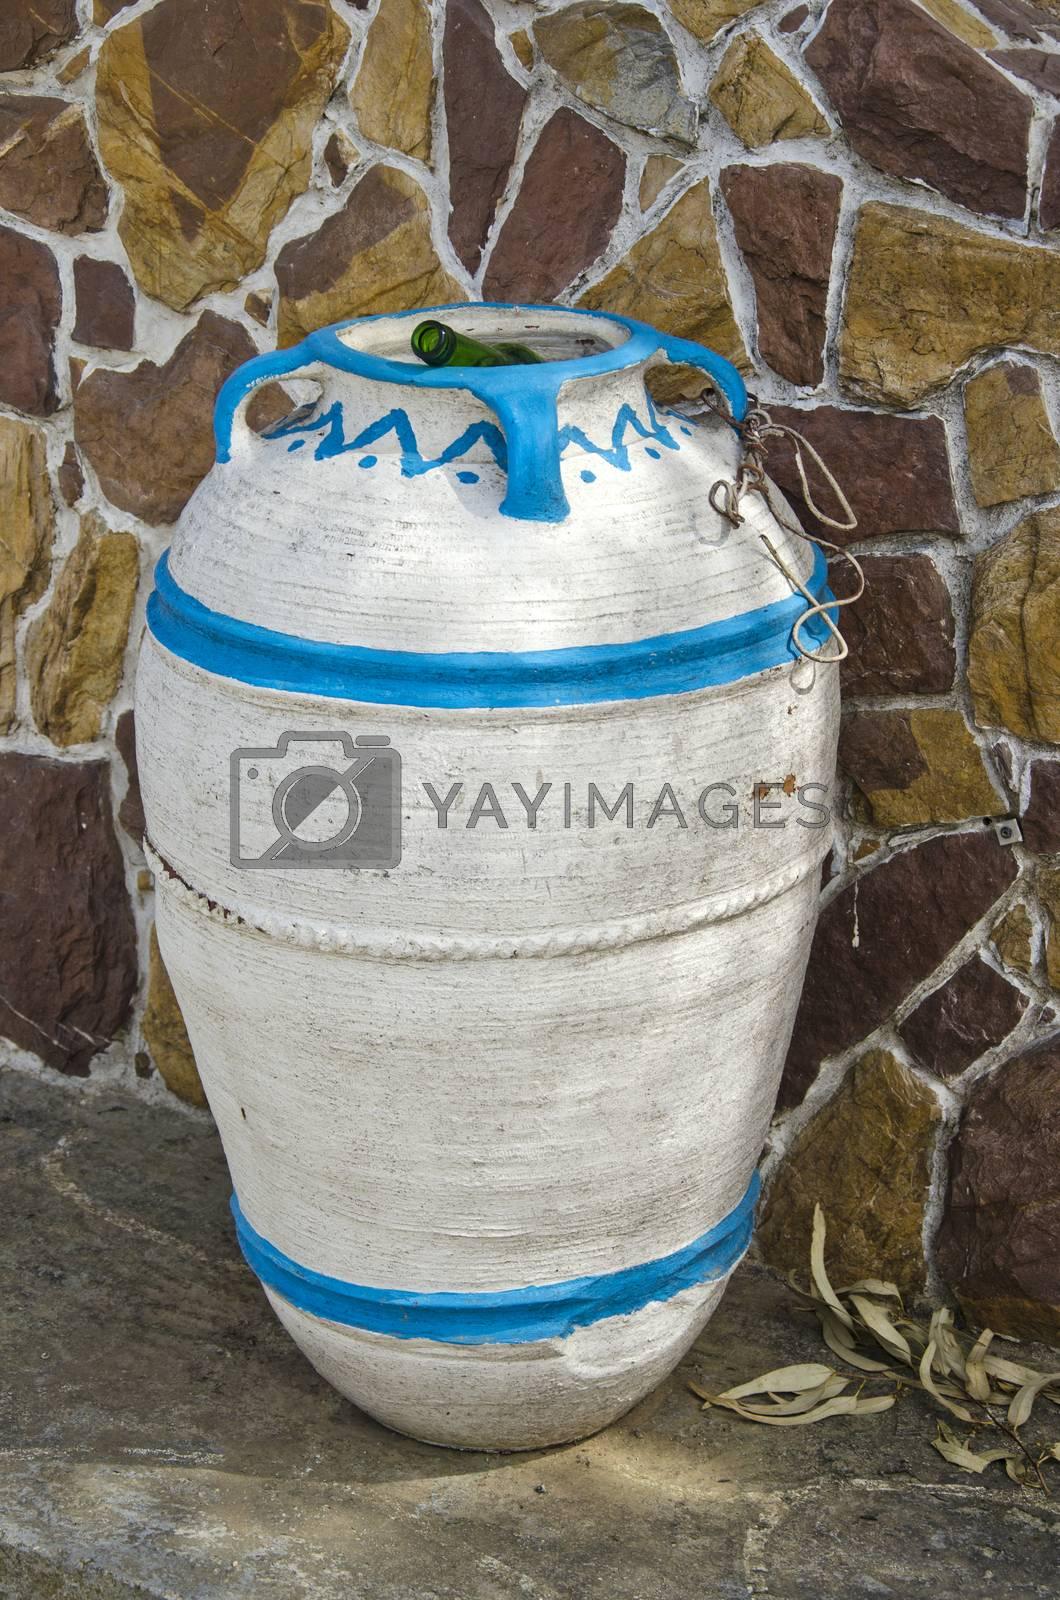 Royalty free image of amphora form dust bin in street, Greece by alis_photo